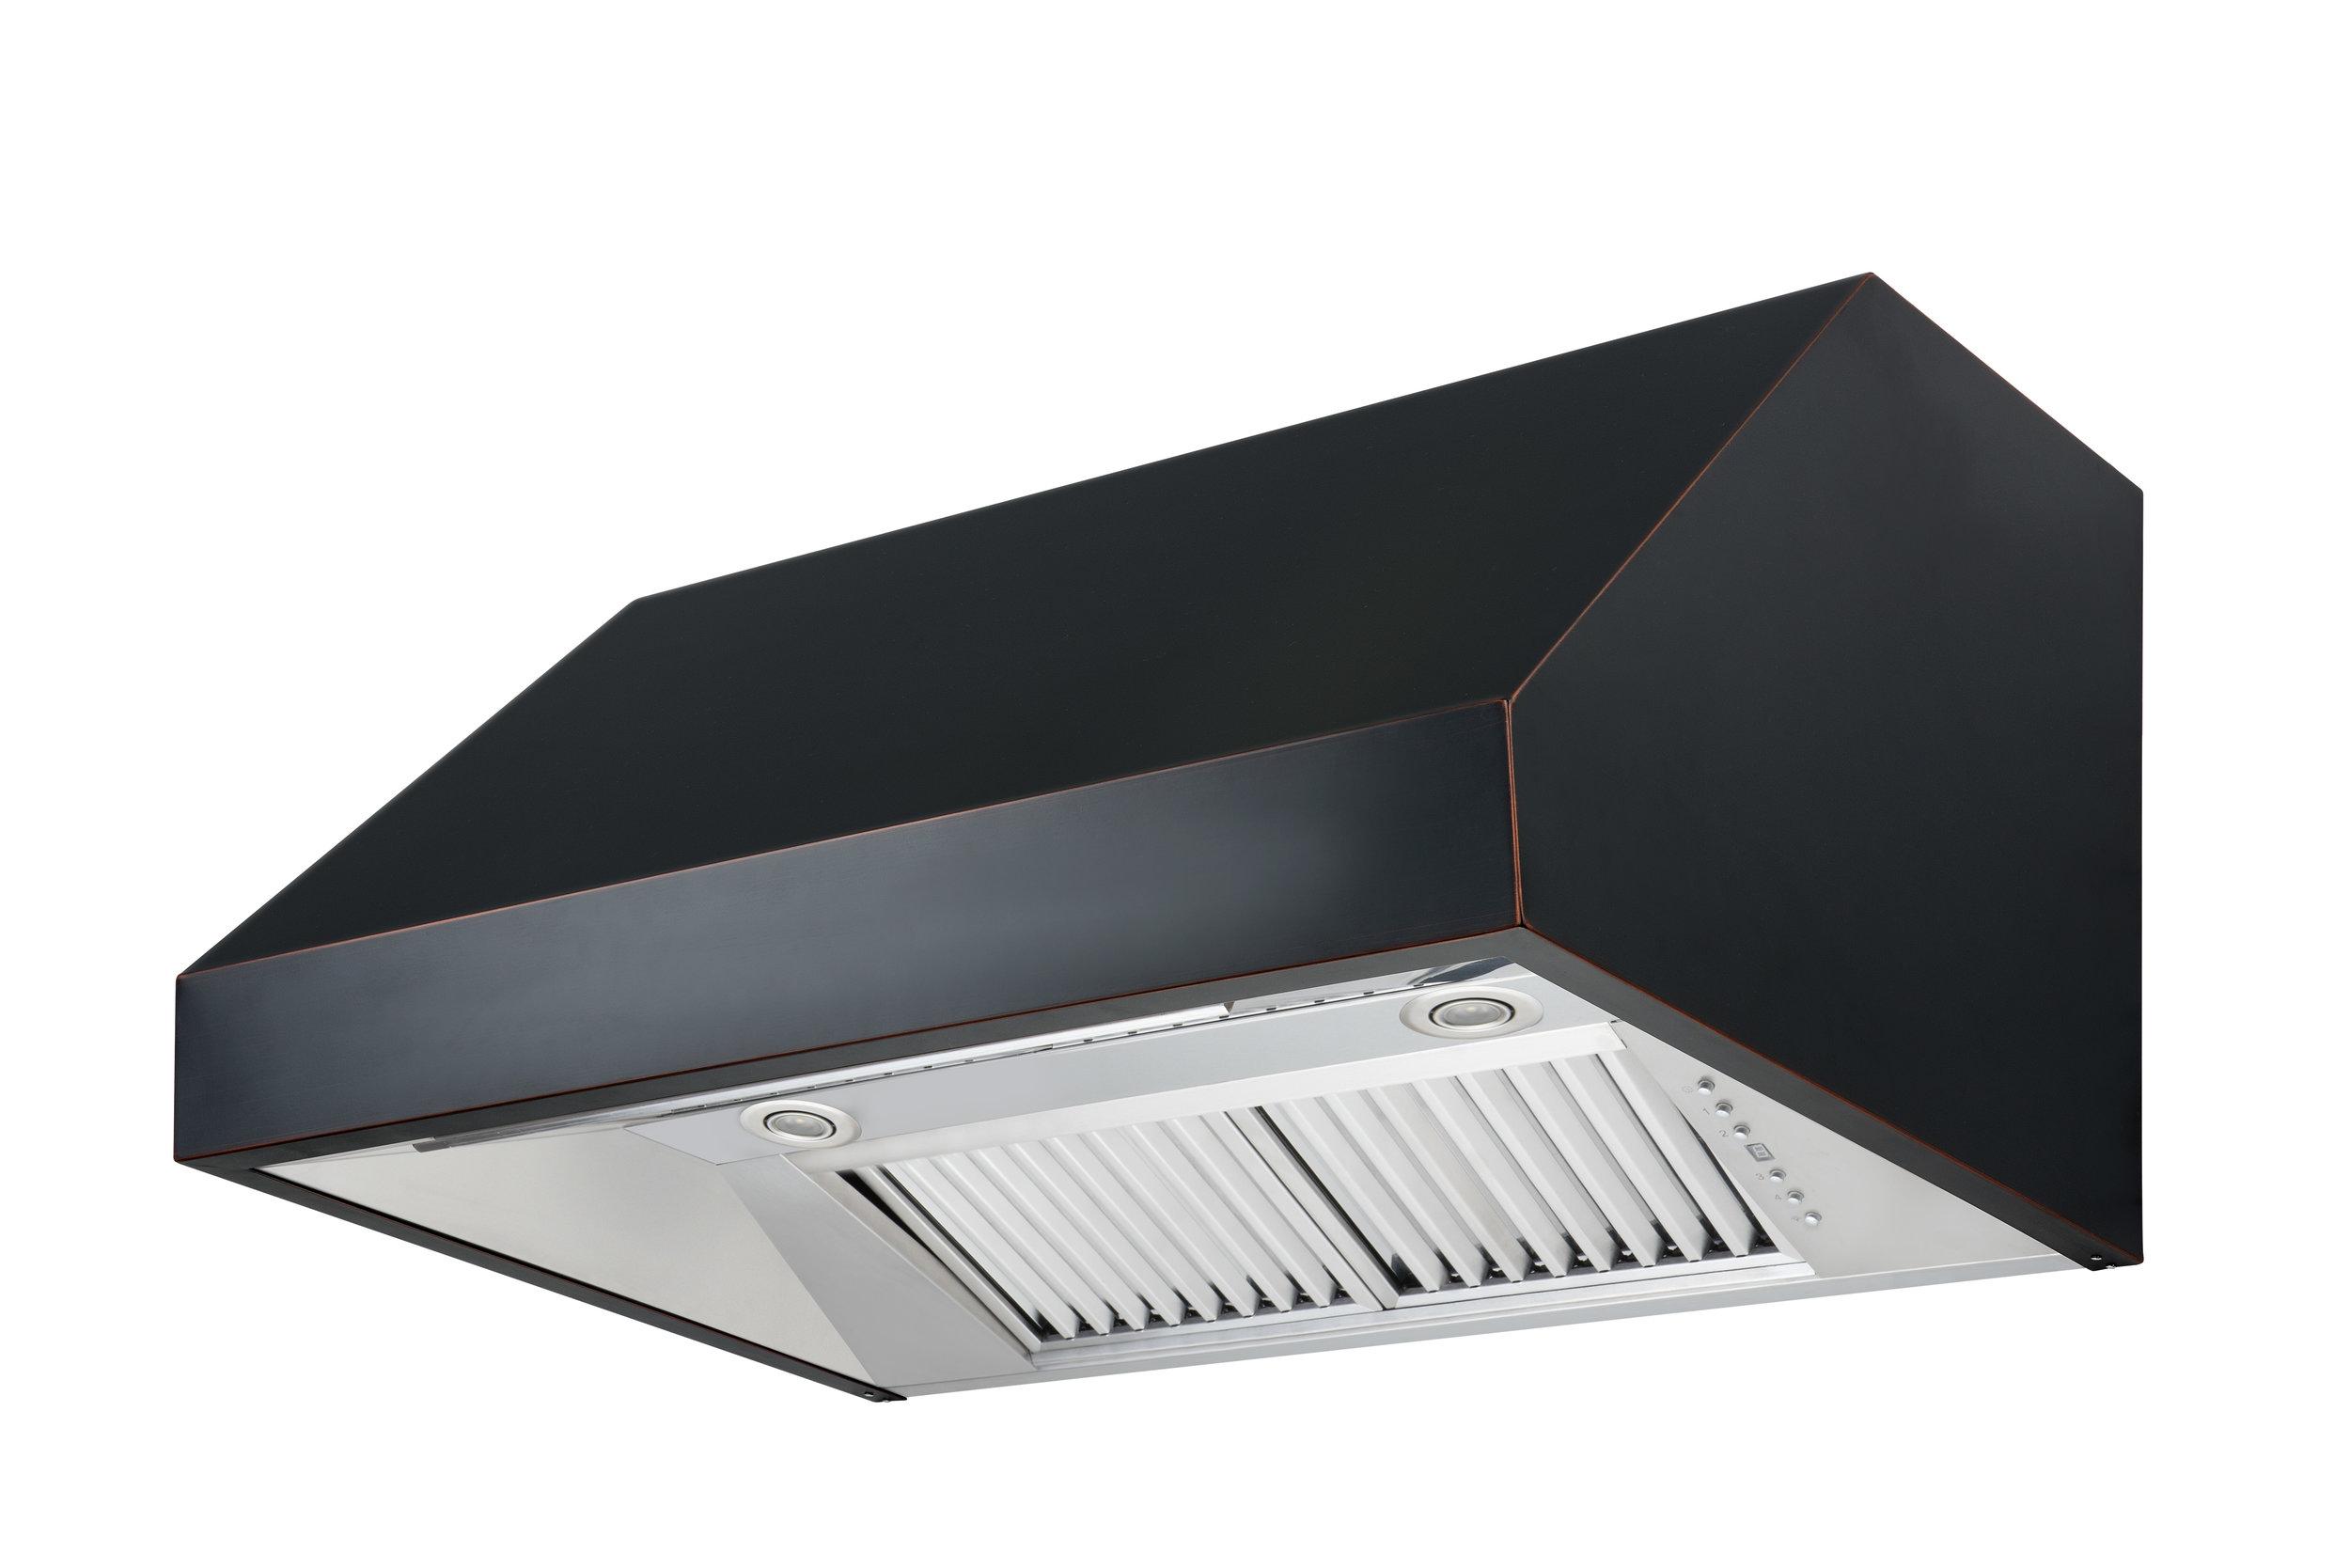 zline-black-under-cabinet-range-hood-8685B-side-under.jpg